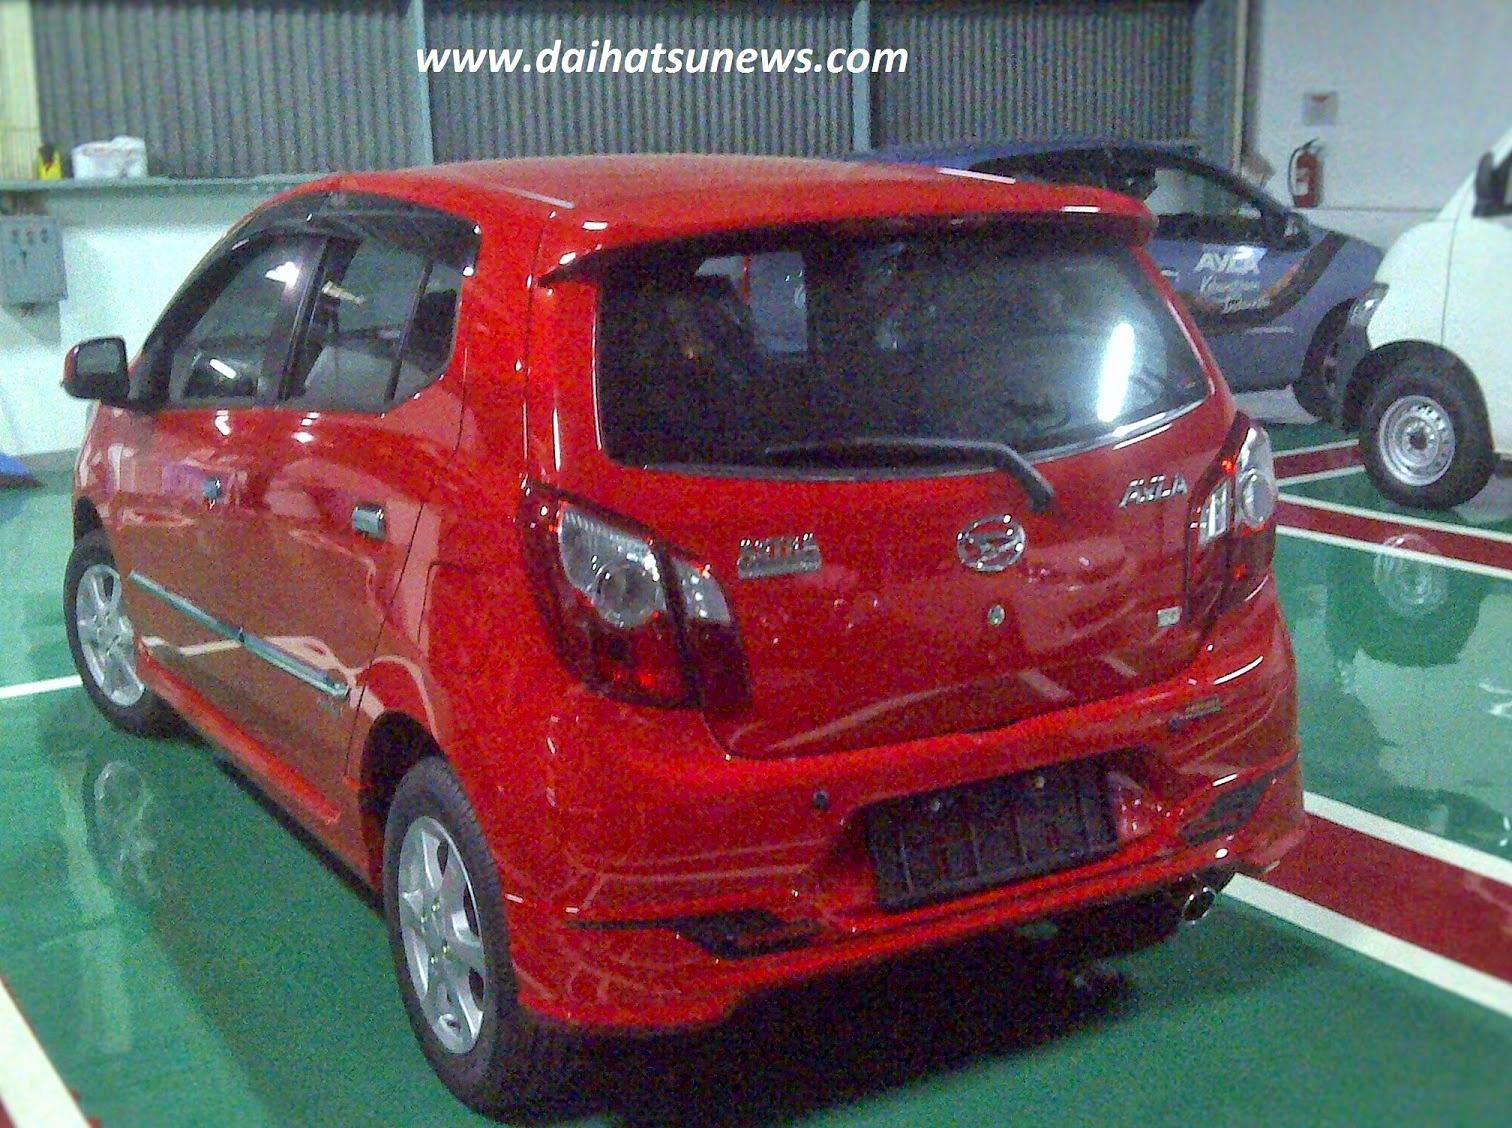 DAIHATSU AYLA ANGSURAN TERMURAH SEJABOTABEK | Harga Daihatsu